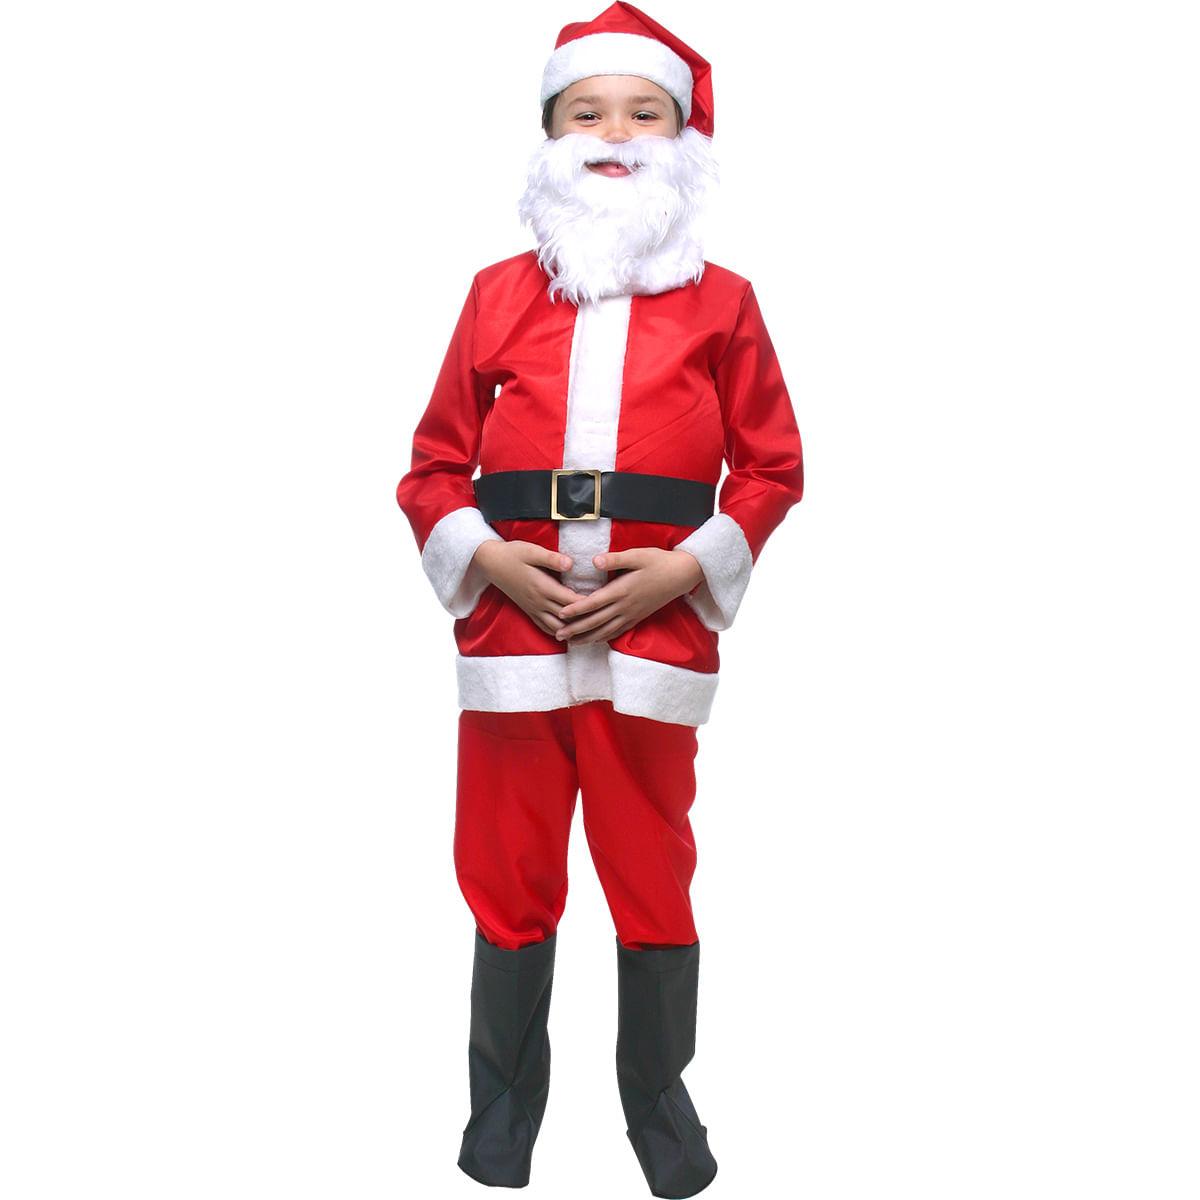 Fantasia Papai Noel Infantil G